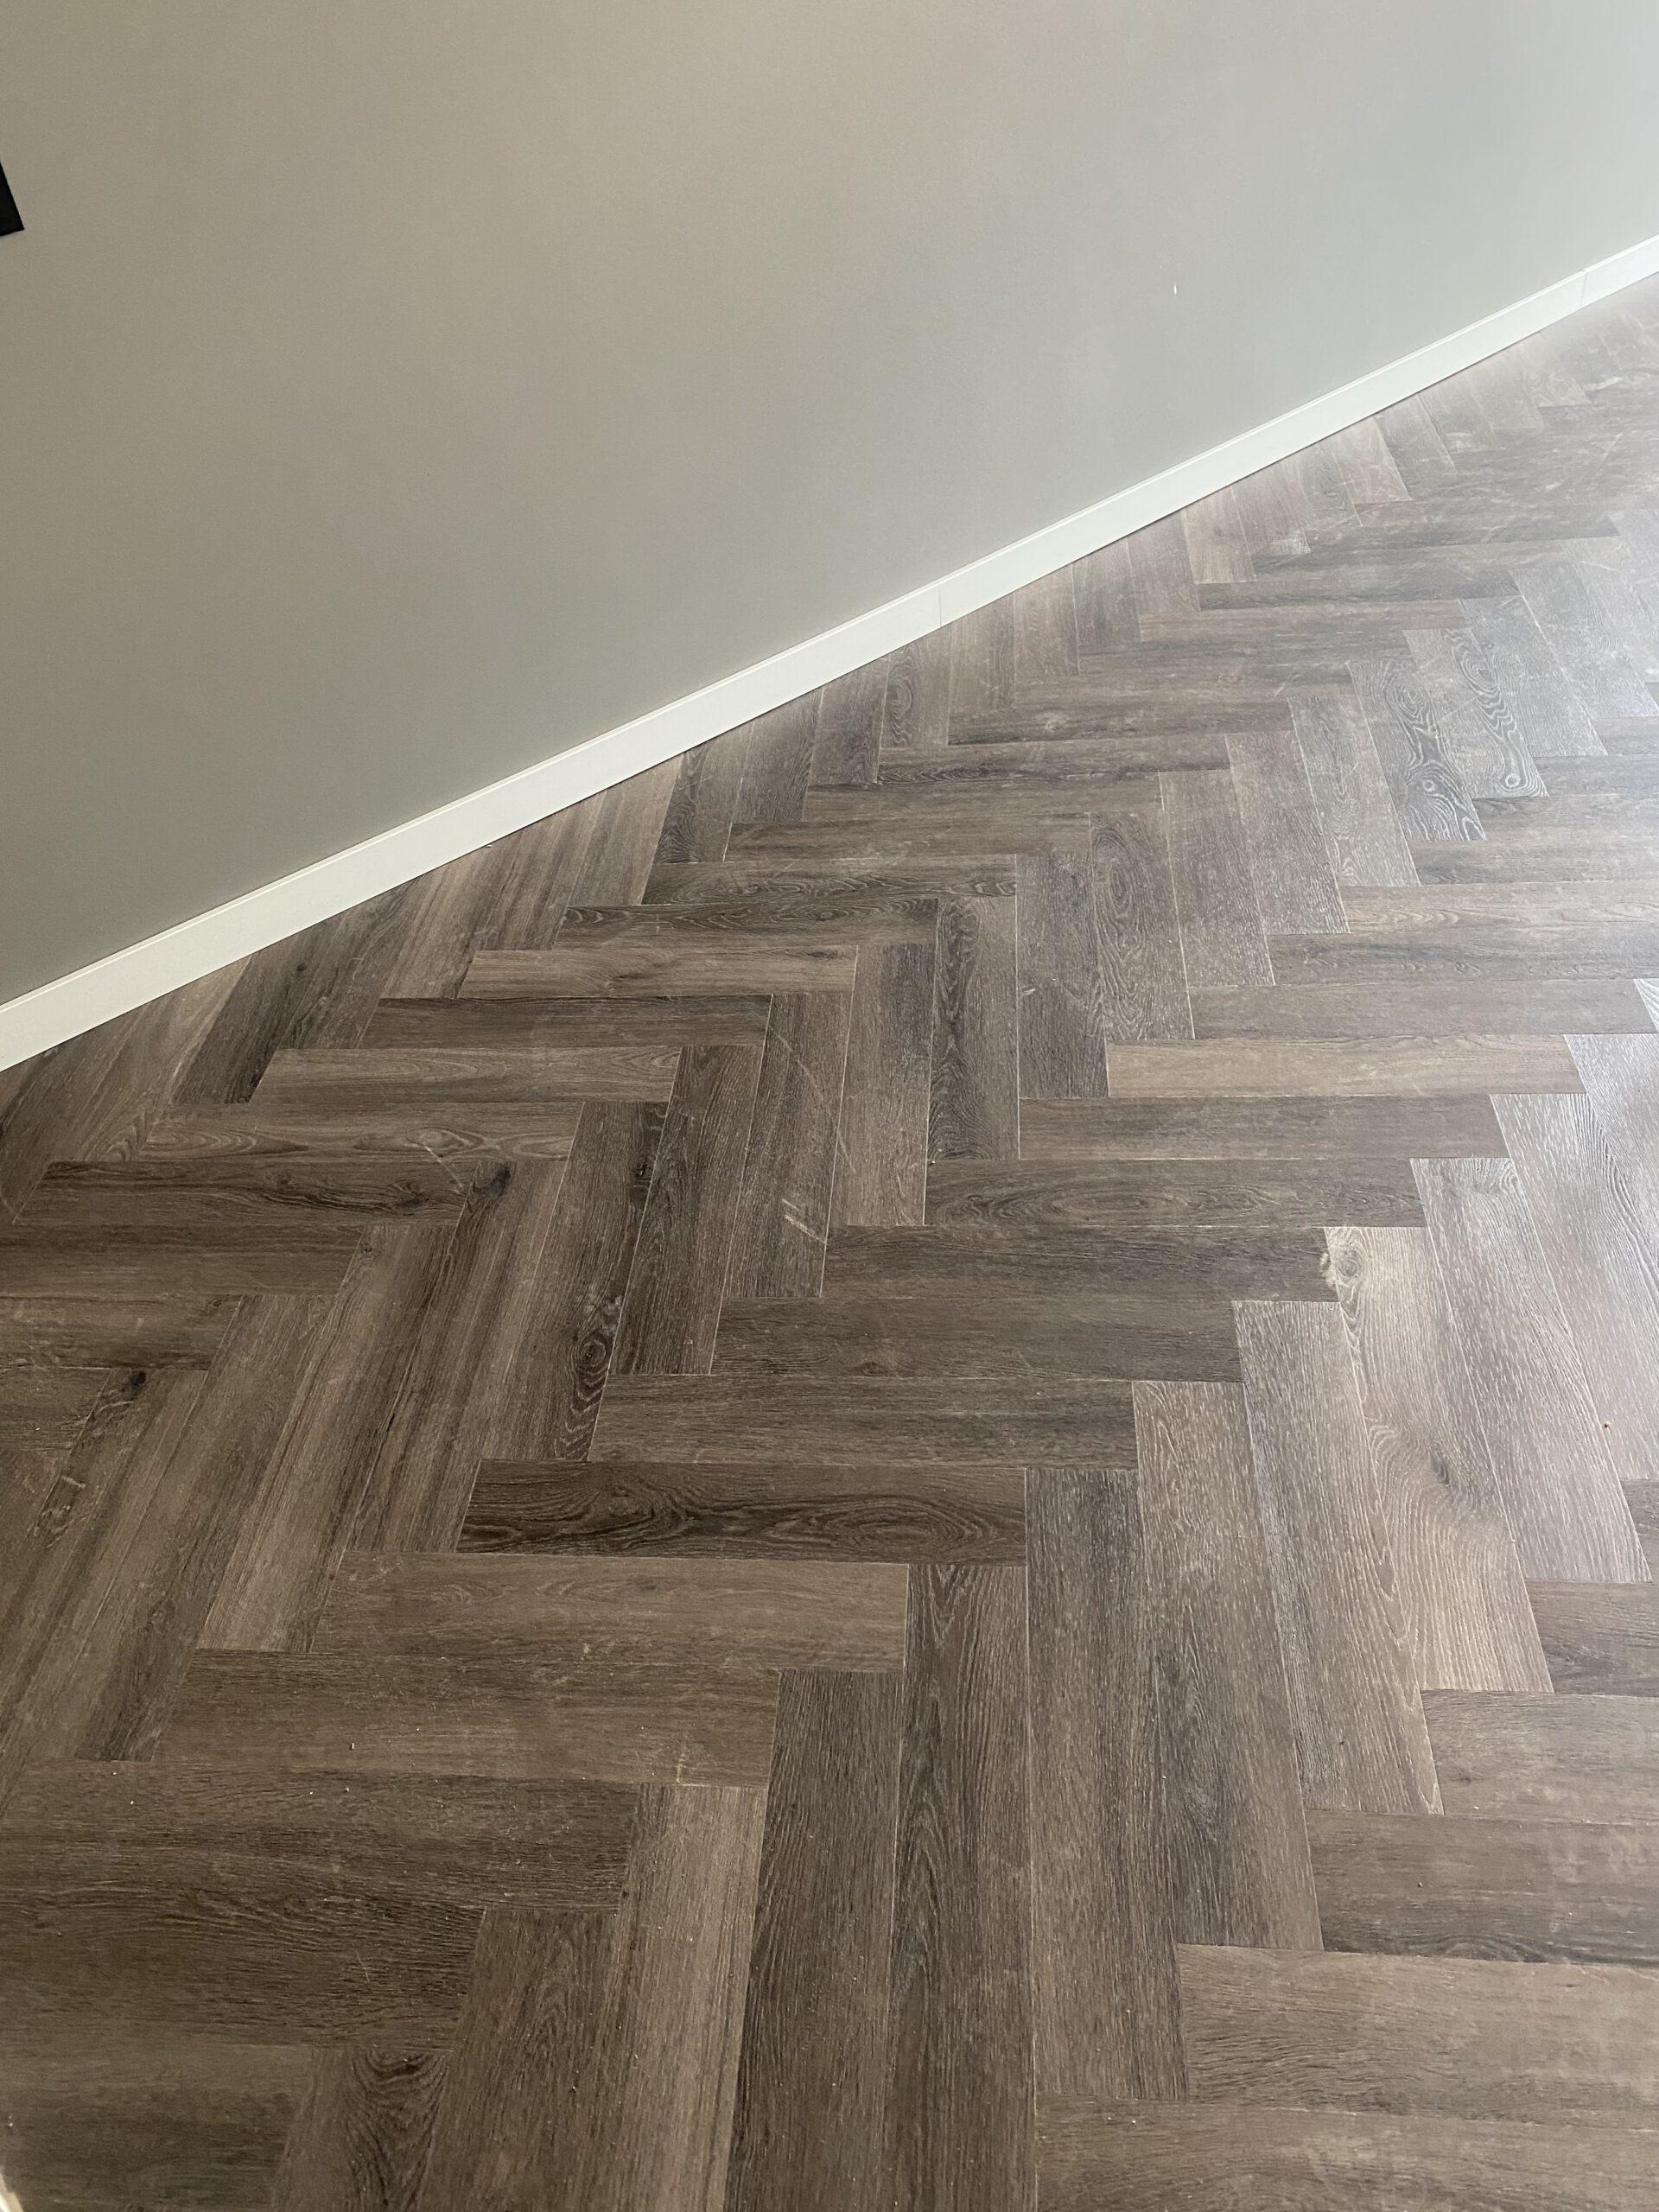 Bacovloeren PVC na egaliseren woonkamer visgraat detail